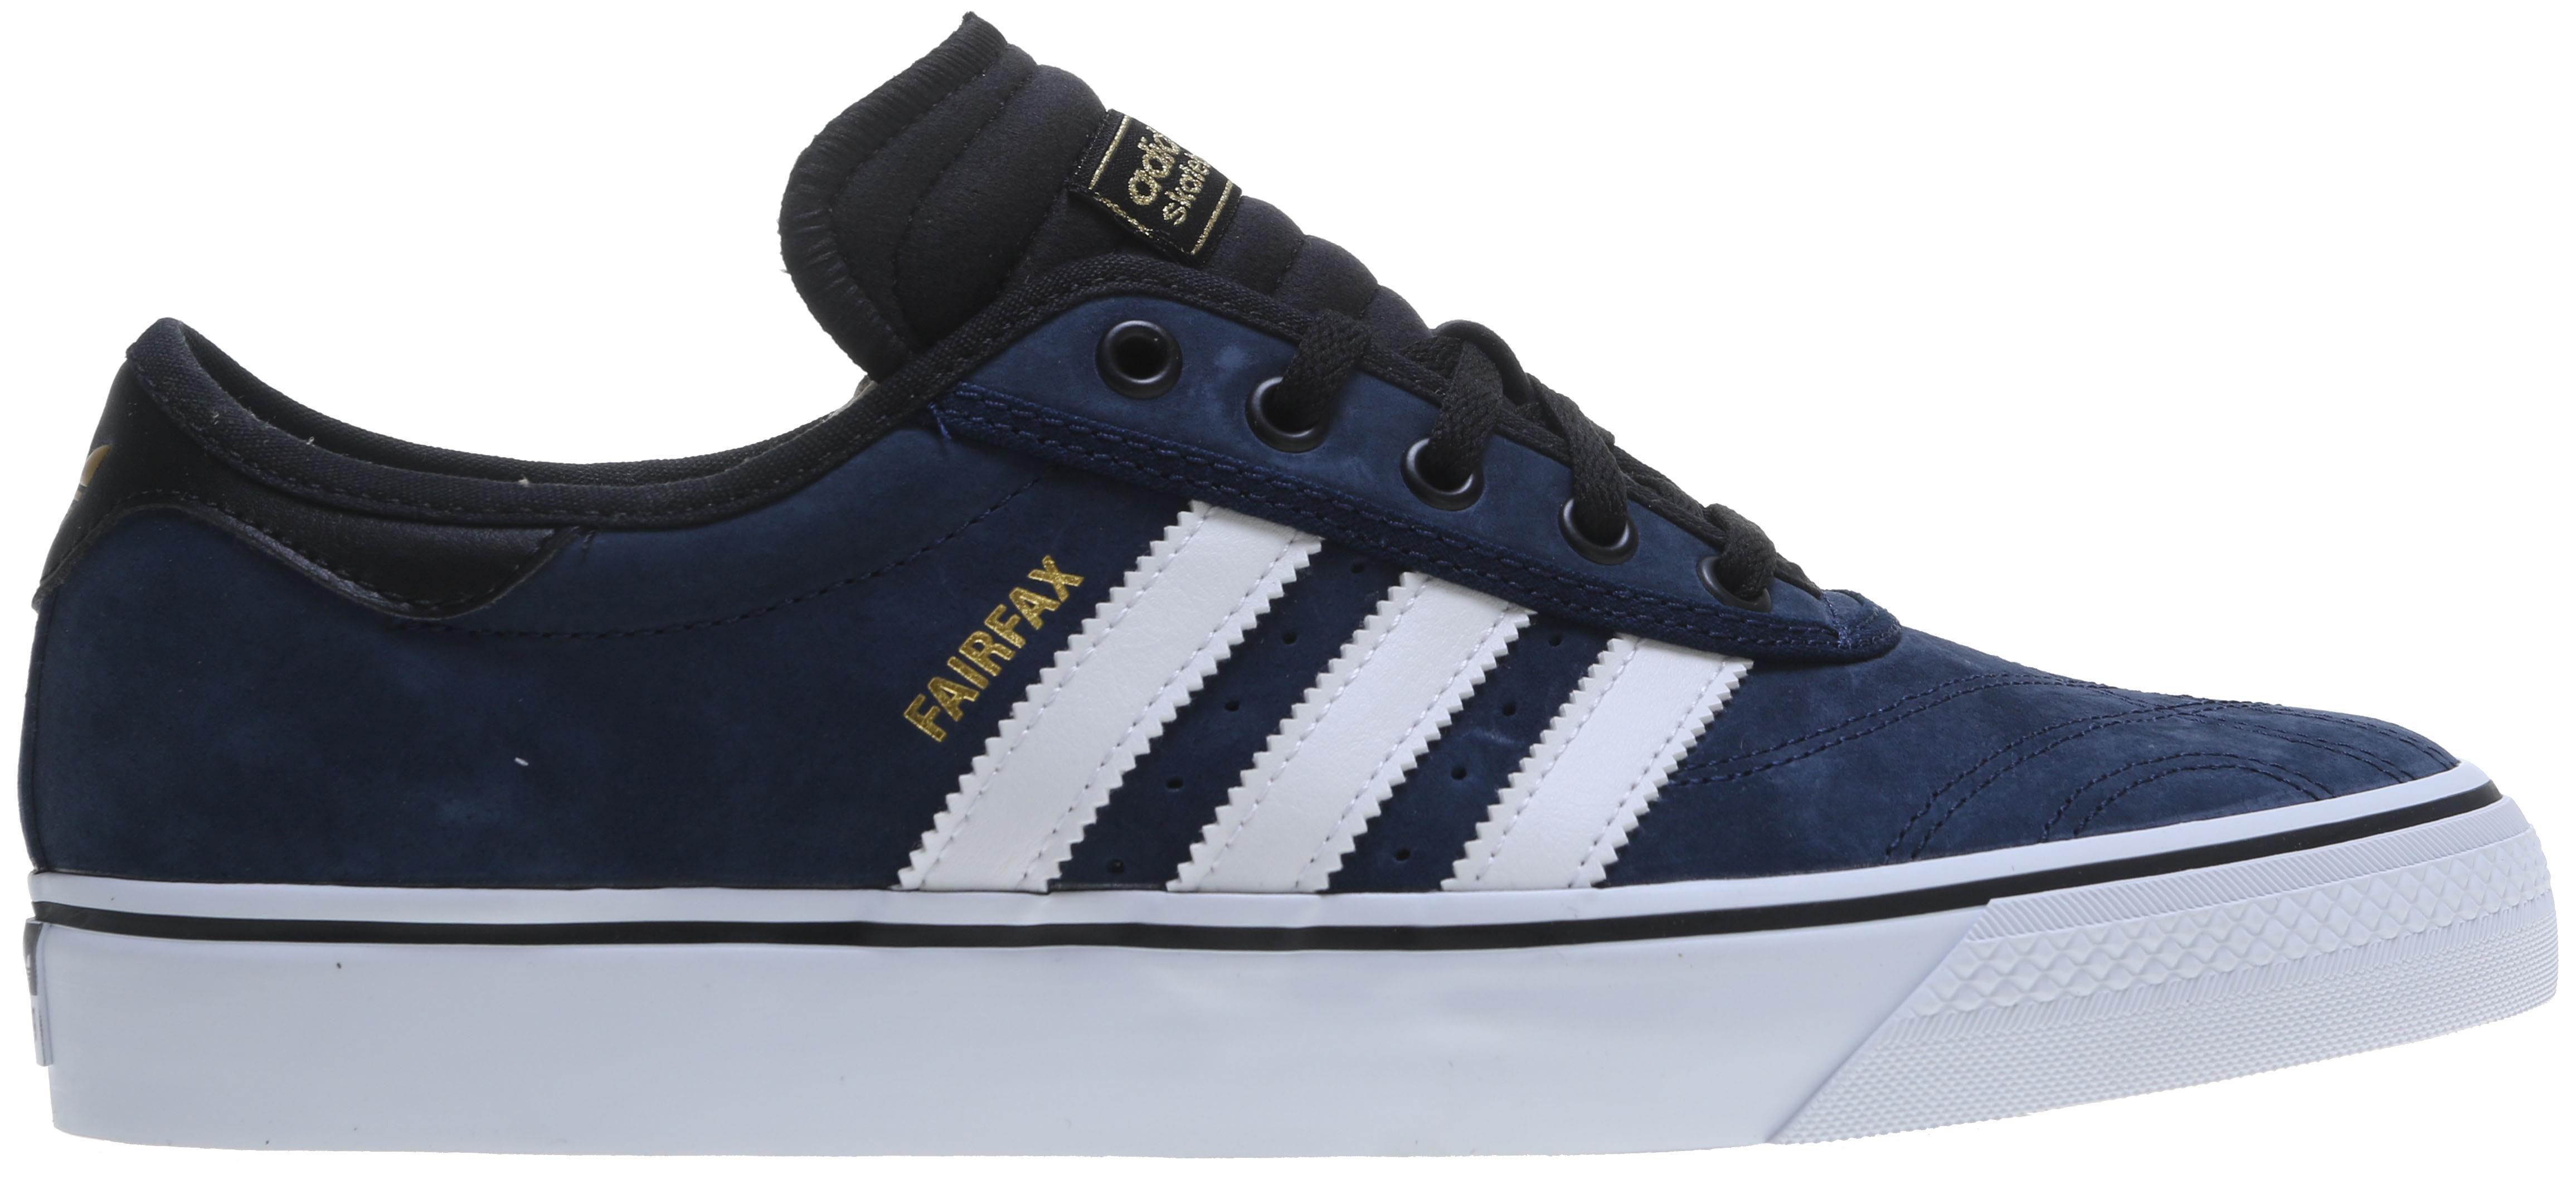 Billig Verkauf Original ADI-EASE PREMIERE - Sneaker low - multicolor Original- Billig Günstig Online z7RSJCa